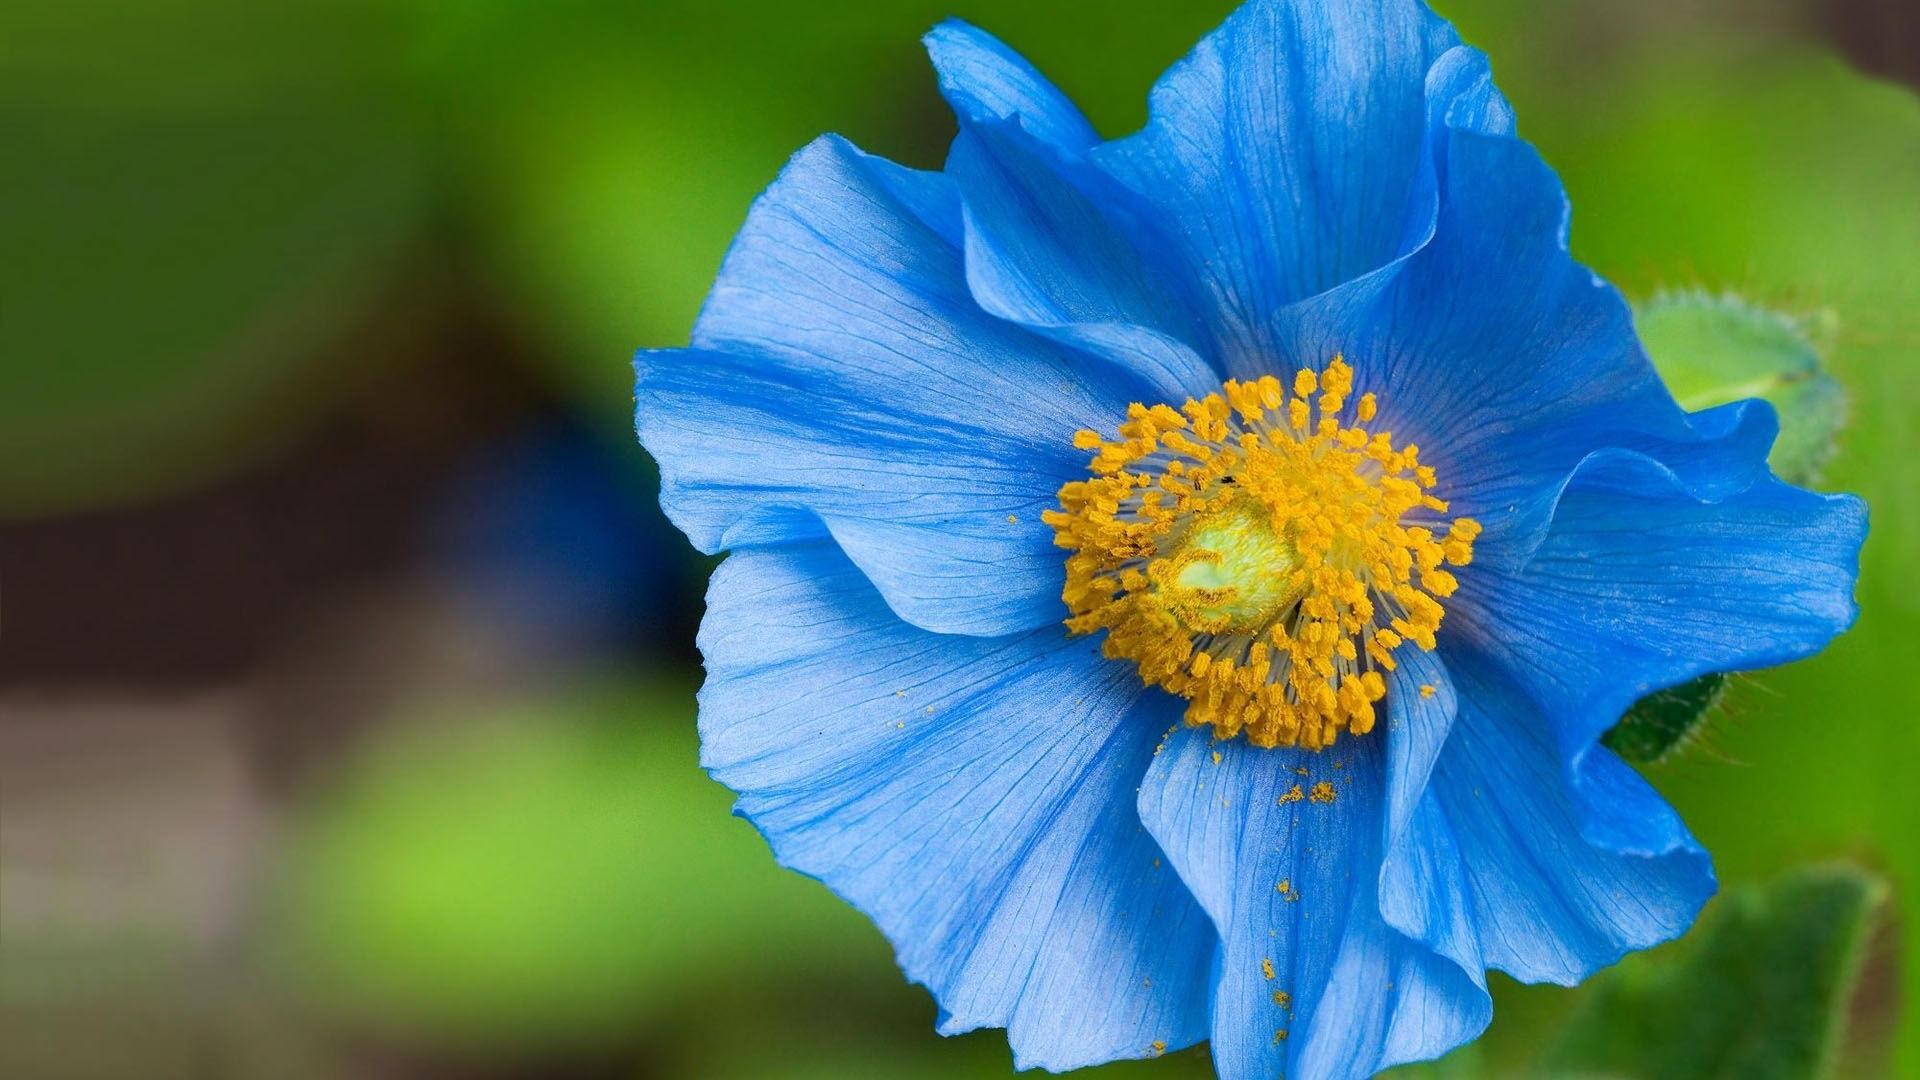 hd wallpapers 1080p flowers desktop full hd wallpapers 1080p flowers 1920x1080